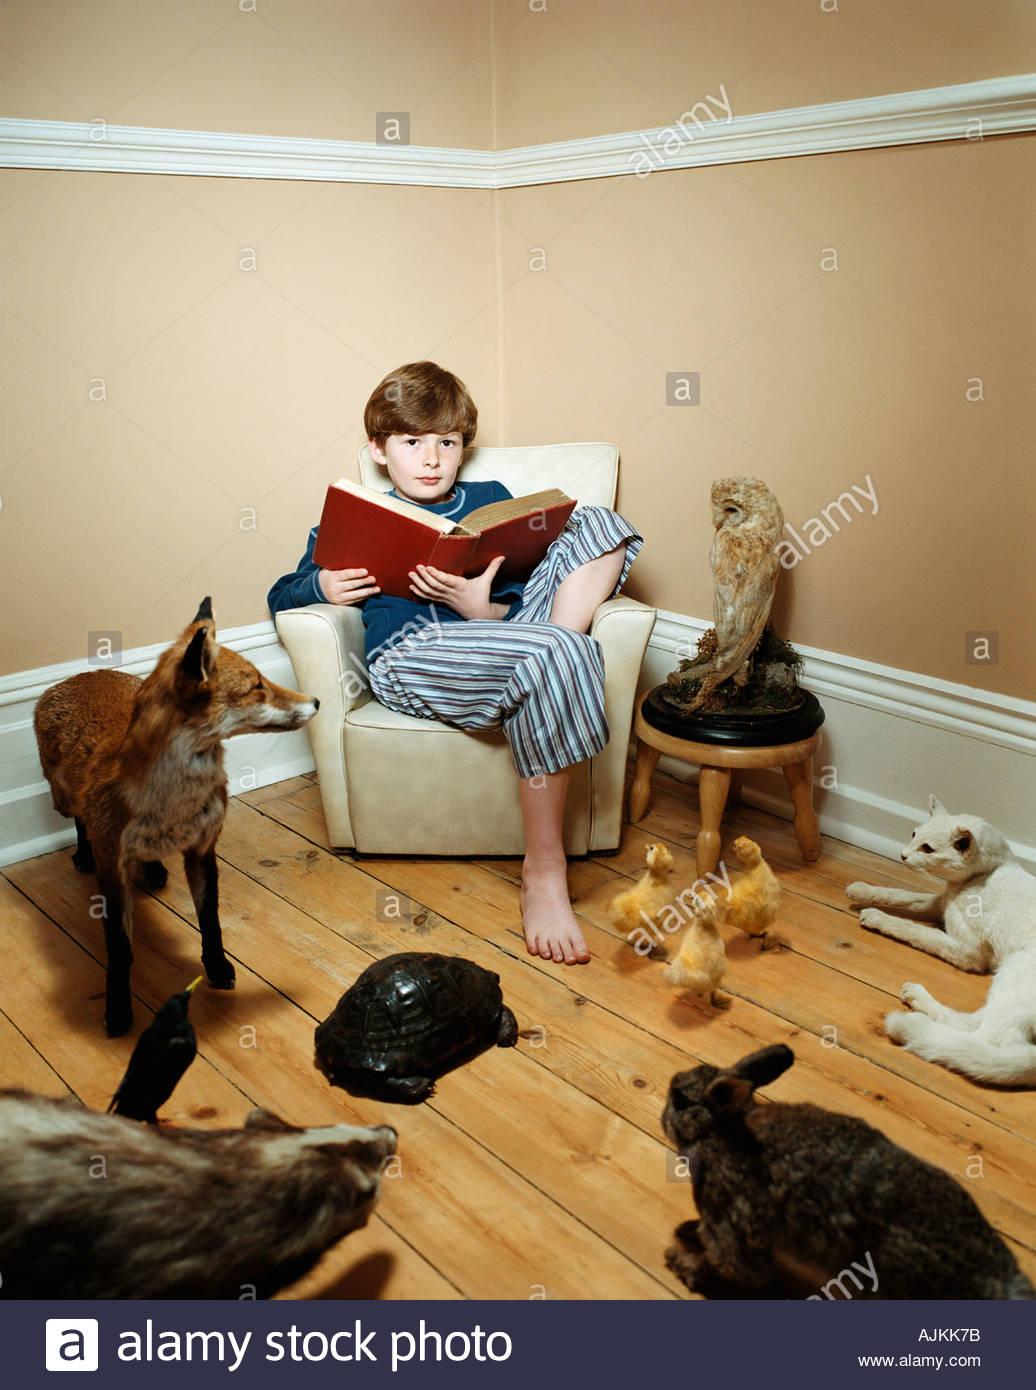 Boy reading story to stuffed animals - Stock Image